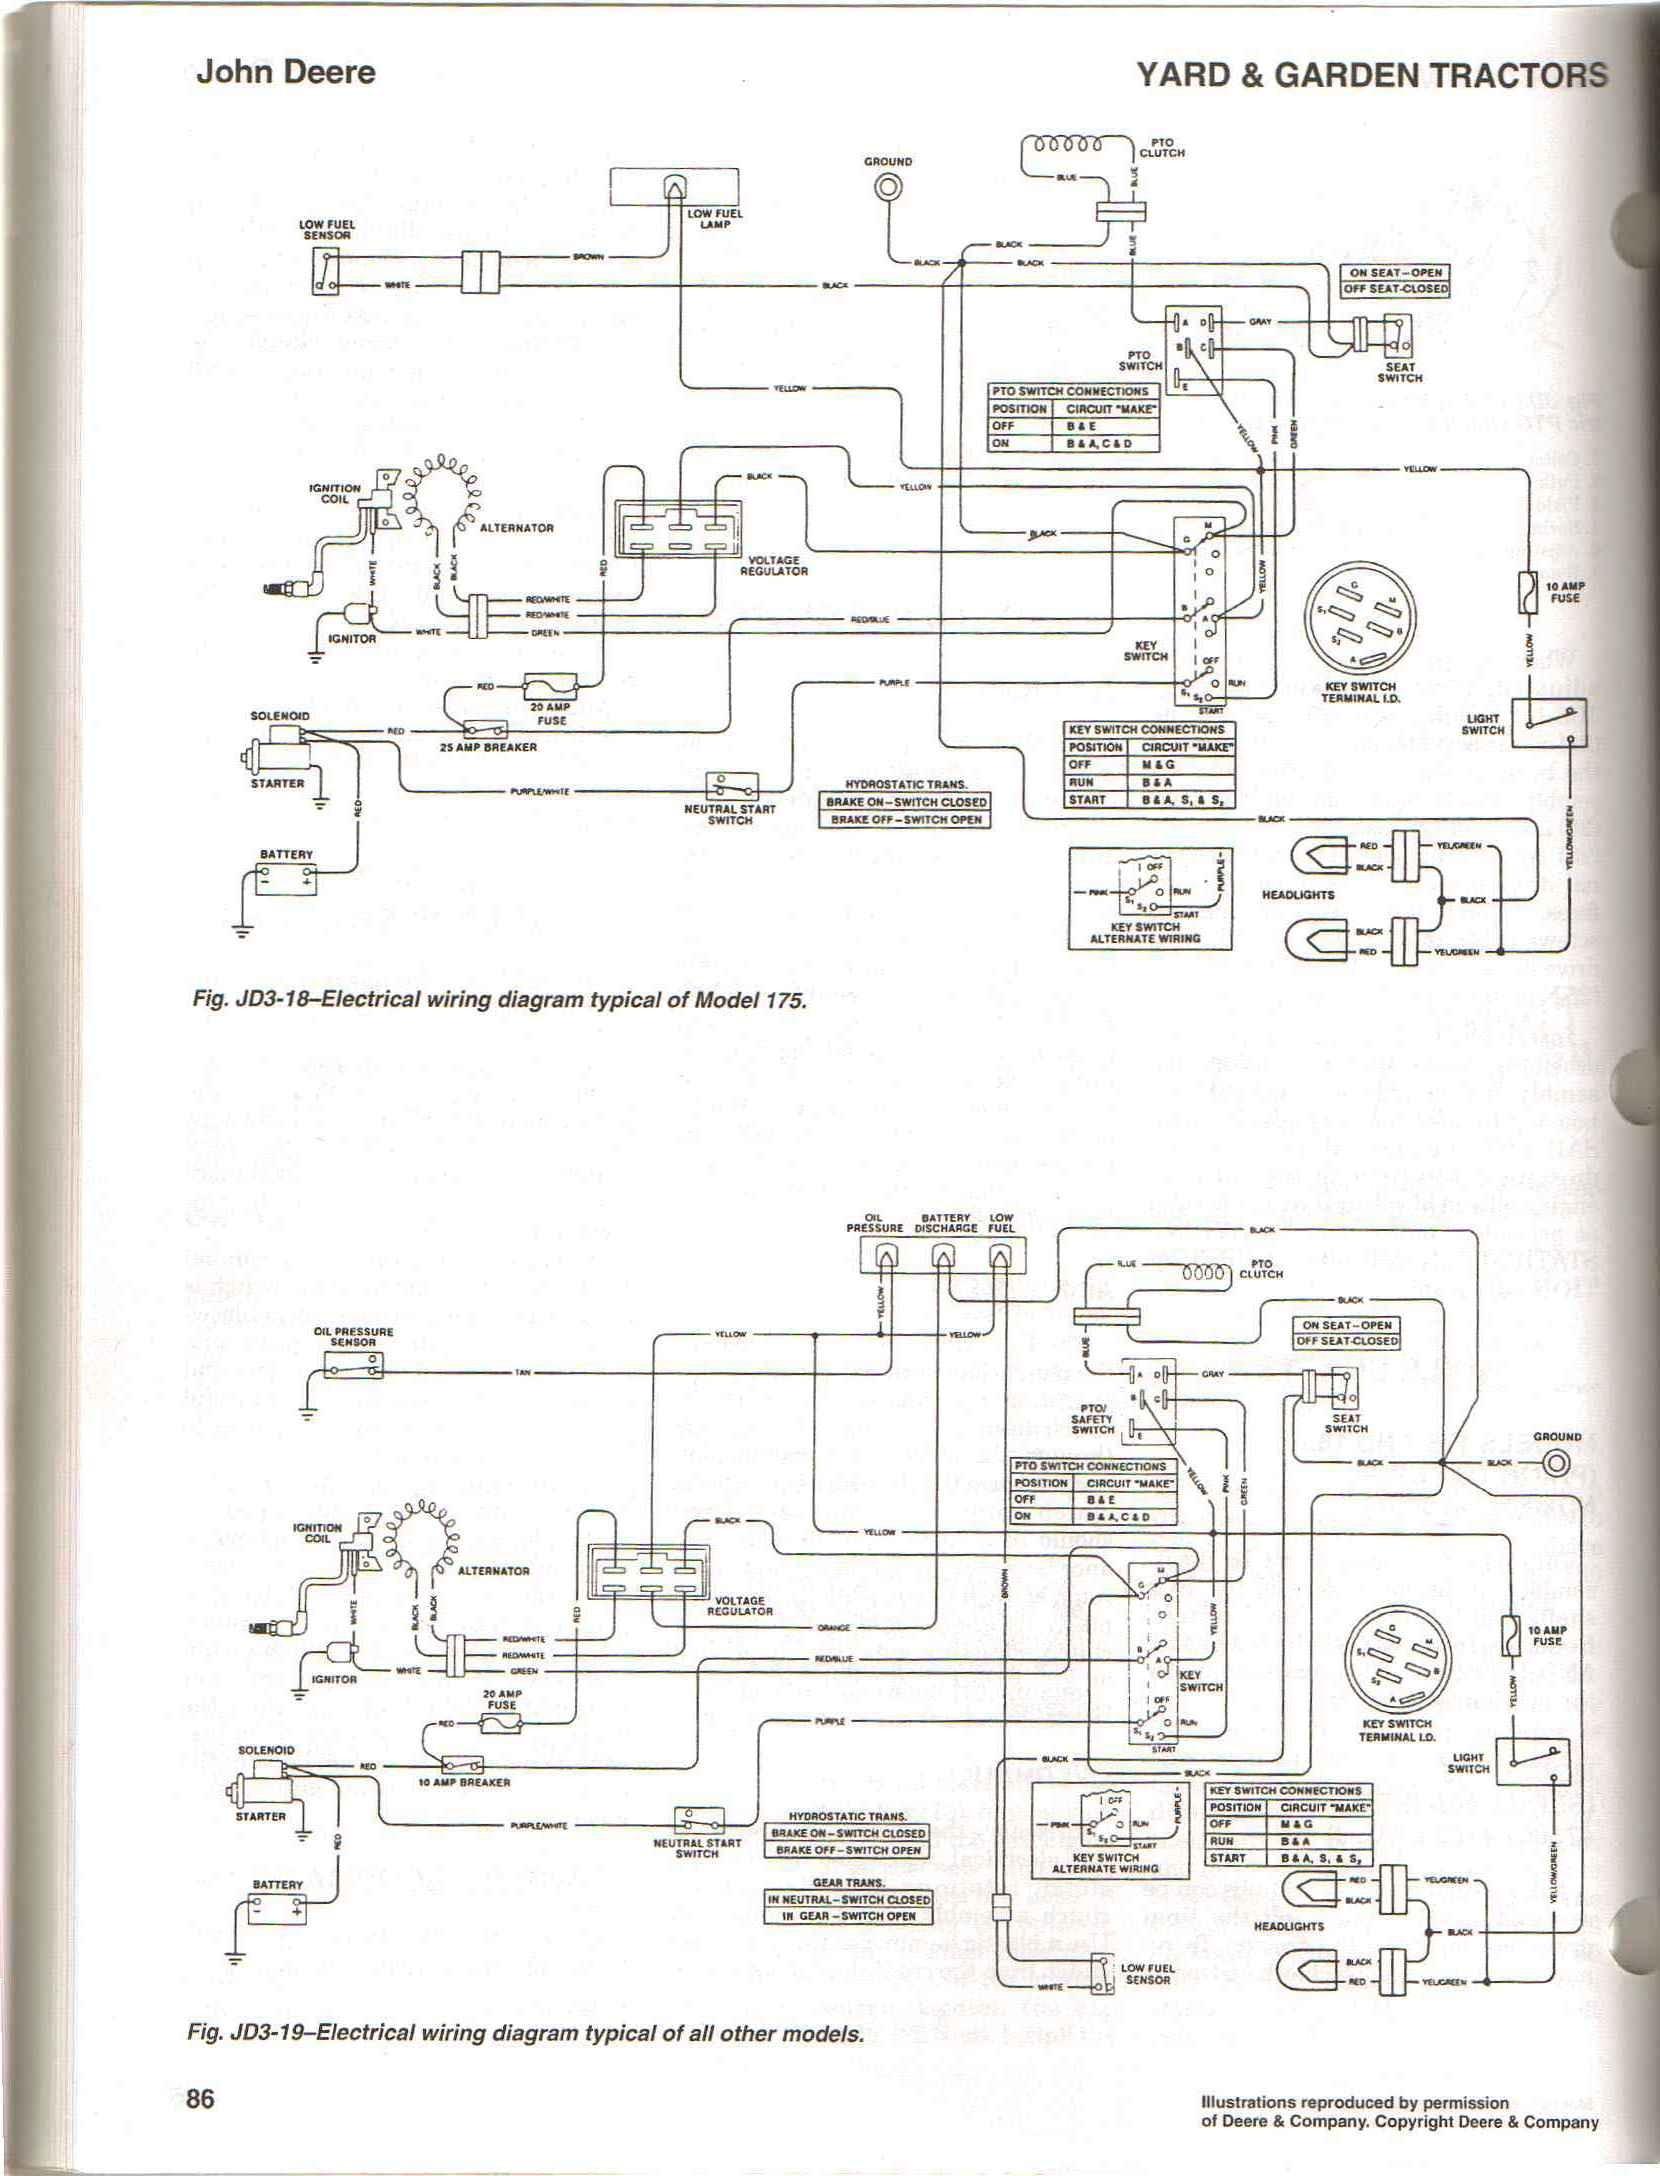 John Deere Gator Tx Fuse Panel Diagram Electrical Wiring Diagrams Combine Box 620i Easy U2022 Cold Air Intake